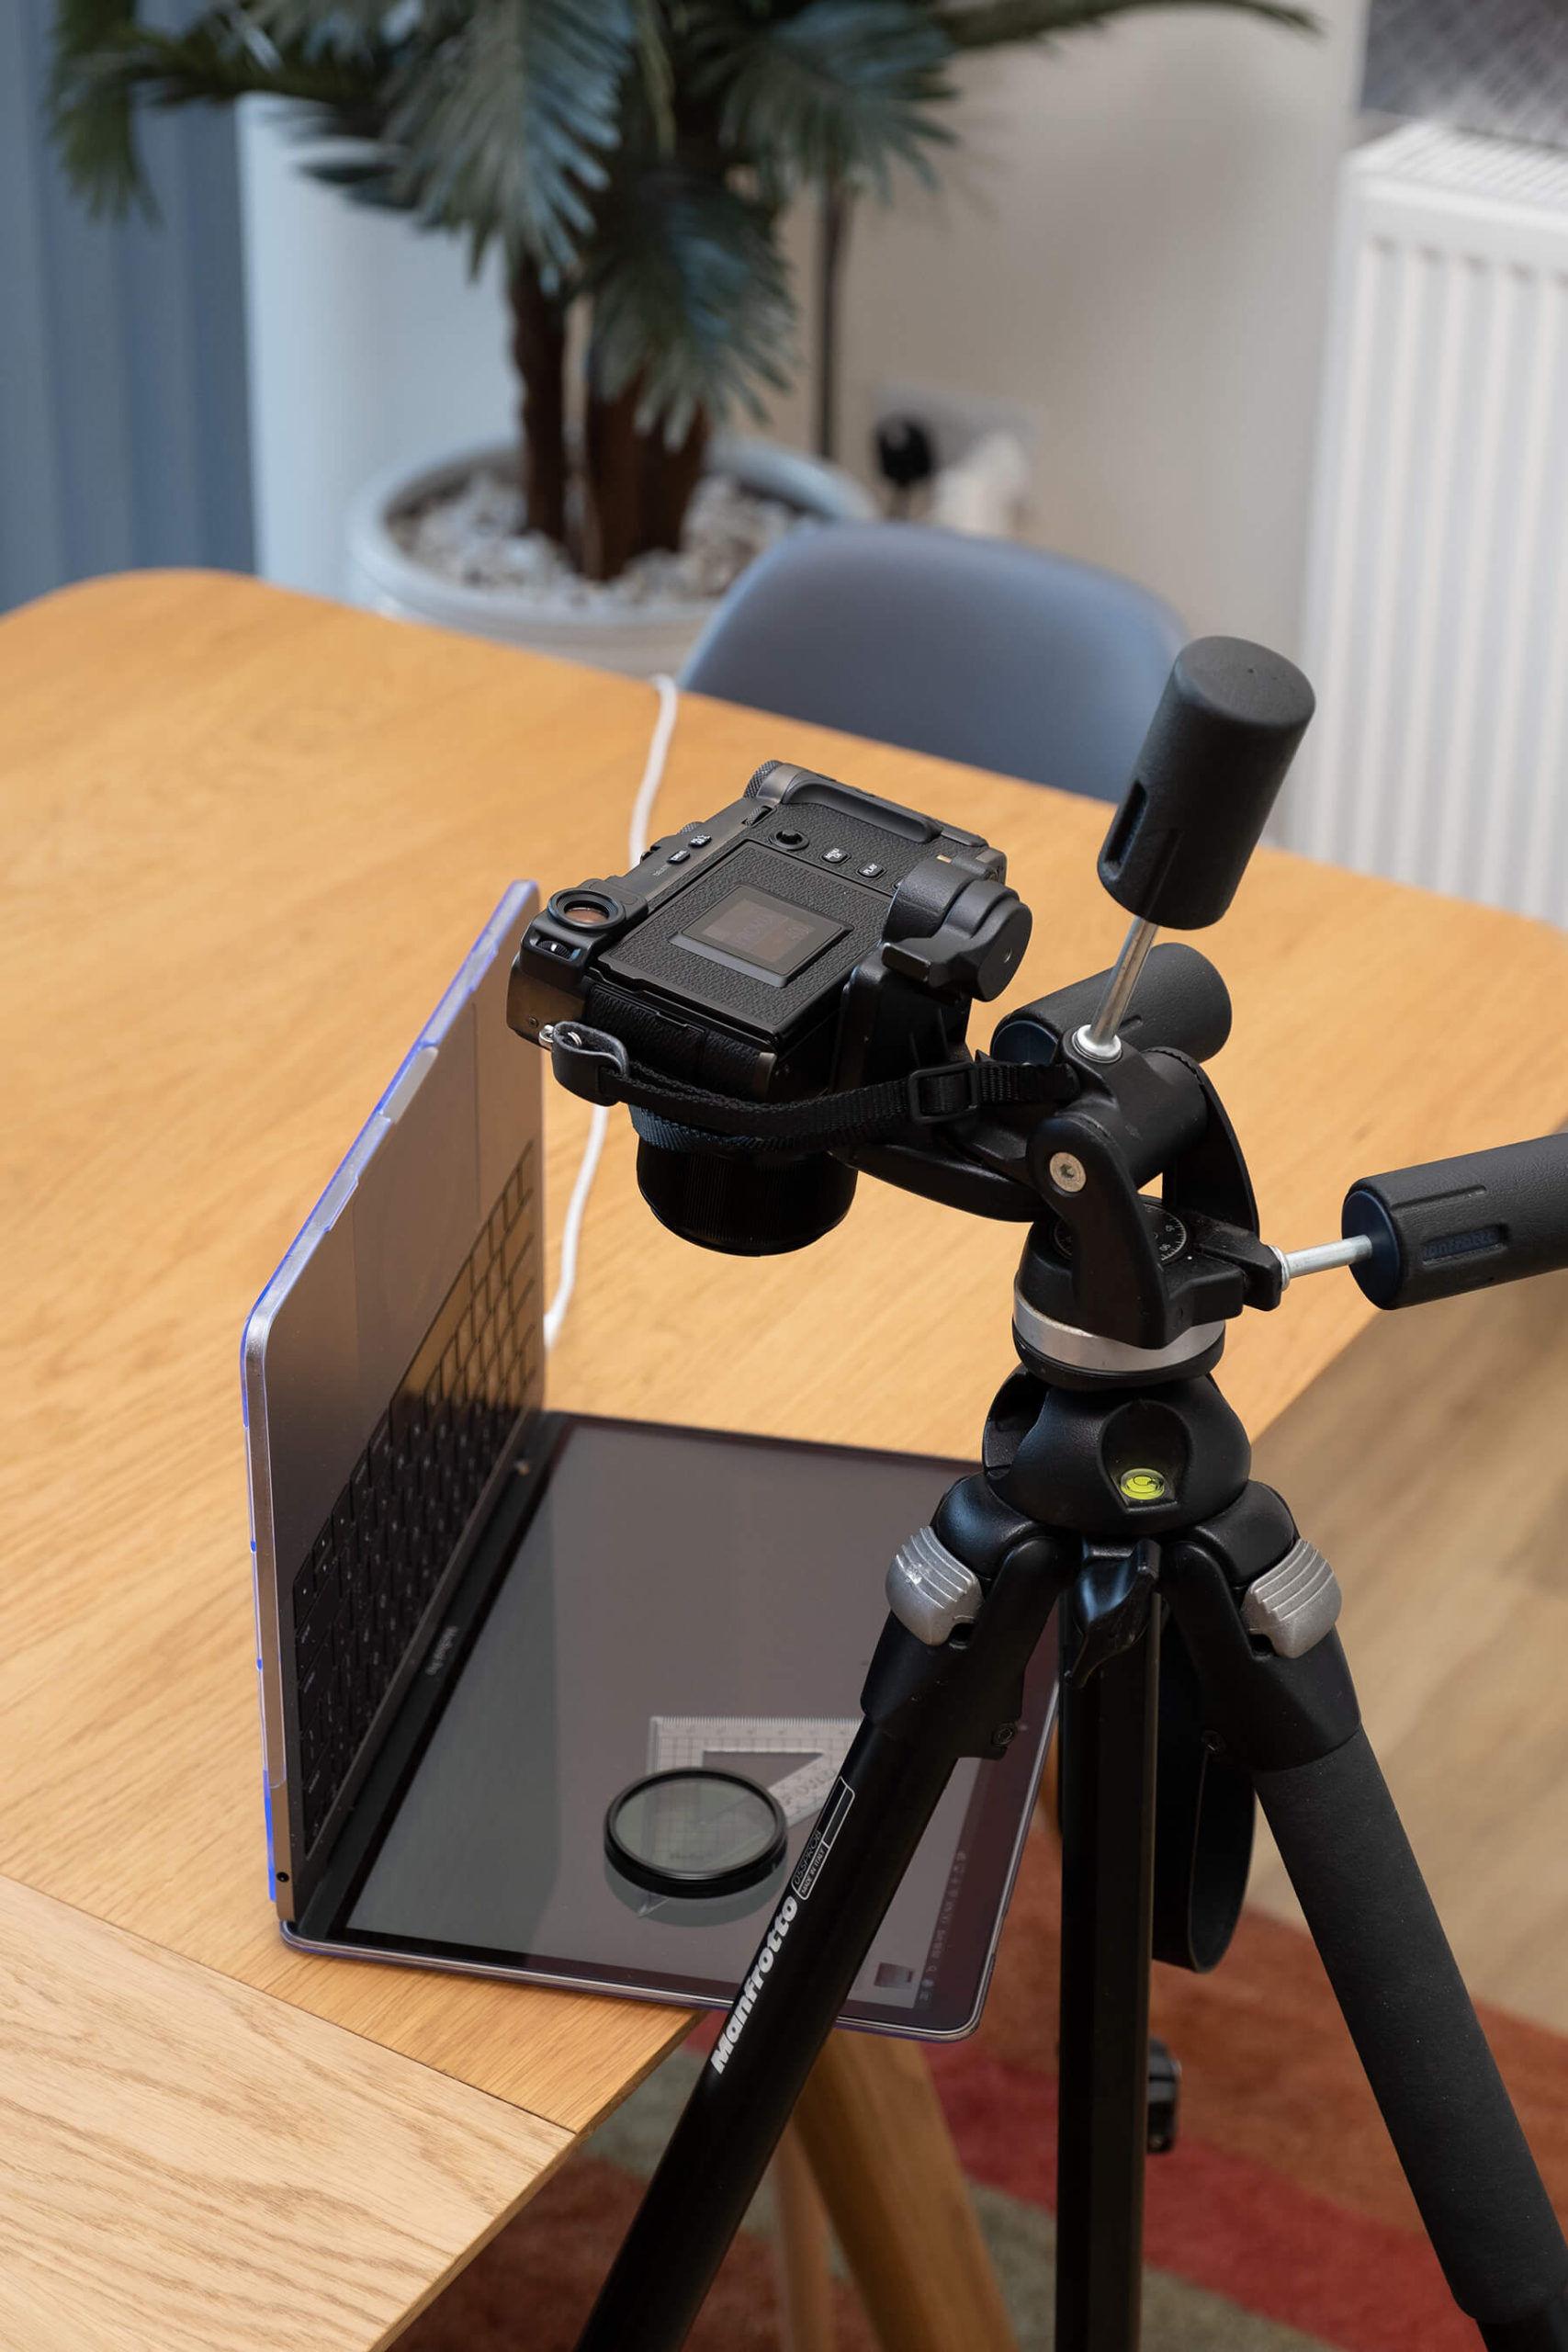 Cross polarisation photography set-up